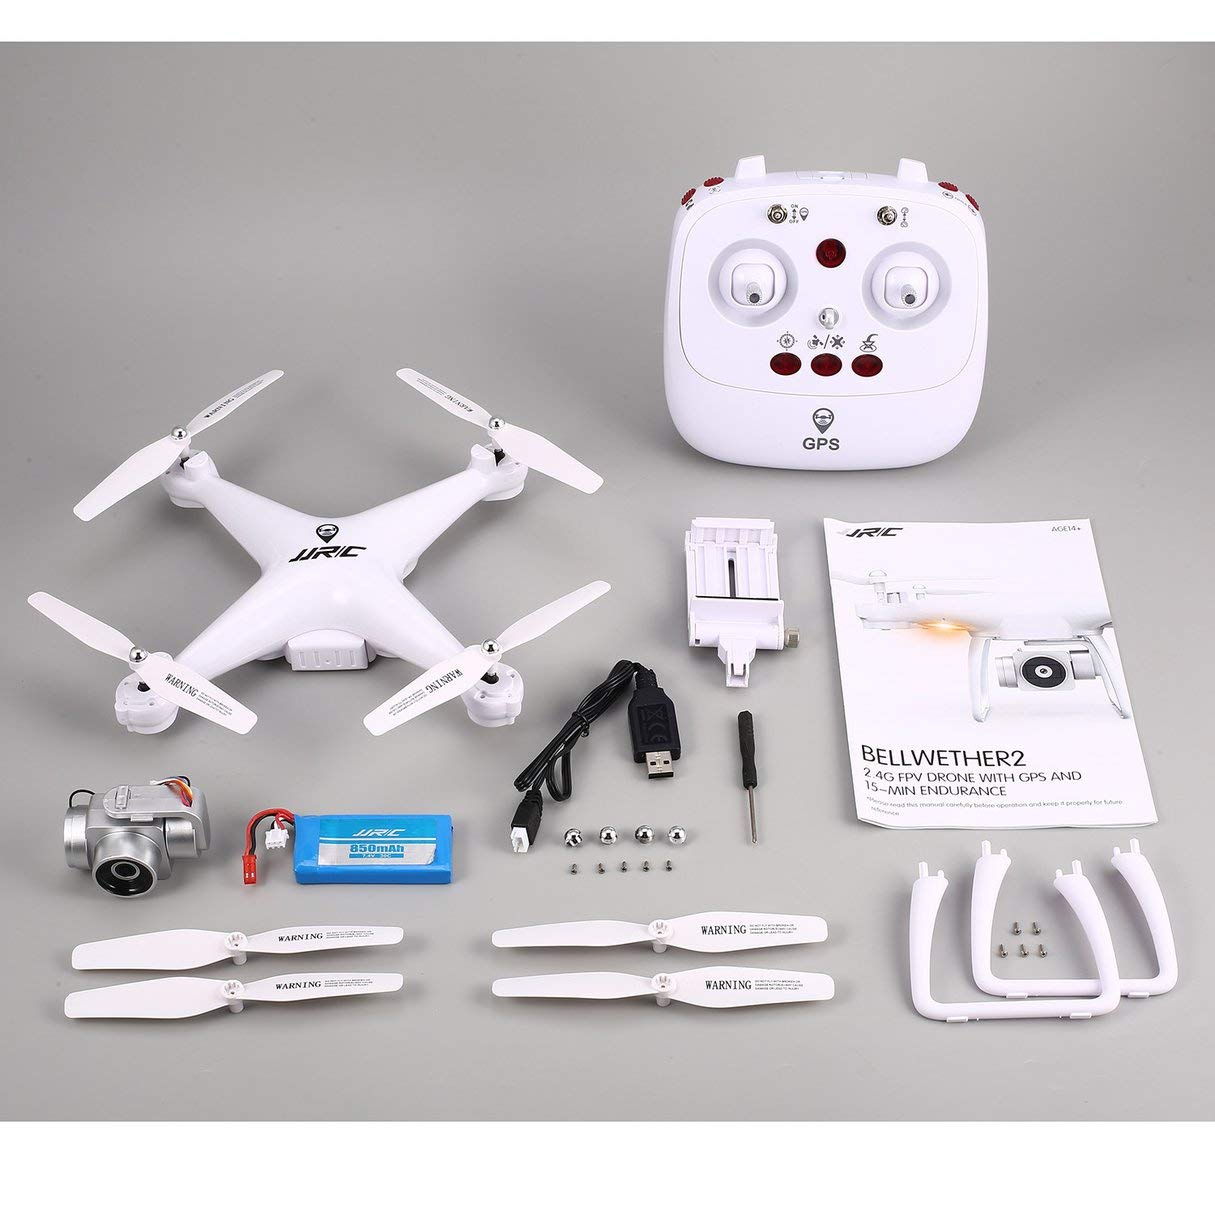 Wafalano RC Quadcopter, JJR/C H68G Selfie, posicionamiento GPS Dual RC Drone Quadcopter con 1080P WiFi FPV Cámara de ángulo Ancho Ajustable Sígueme